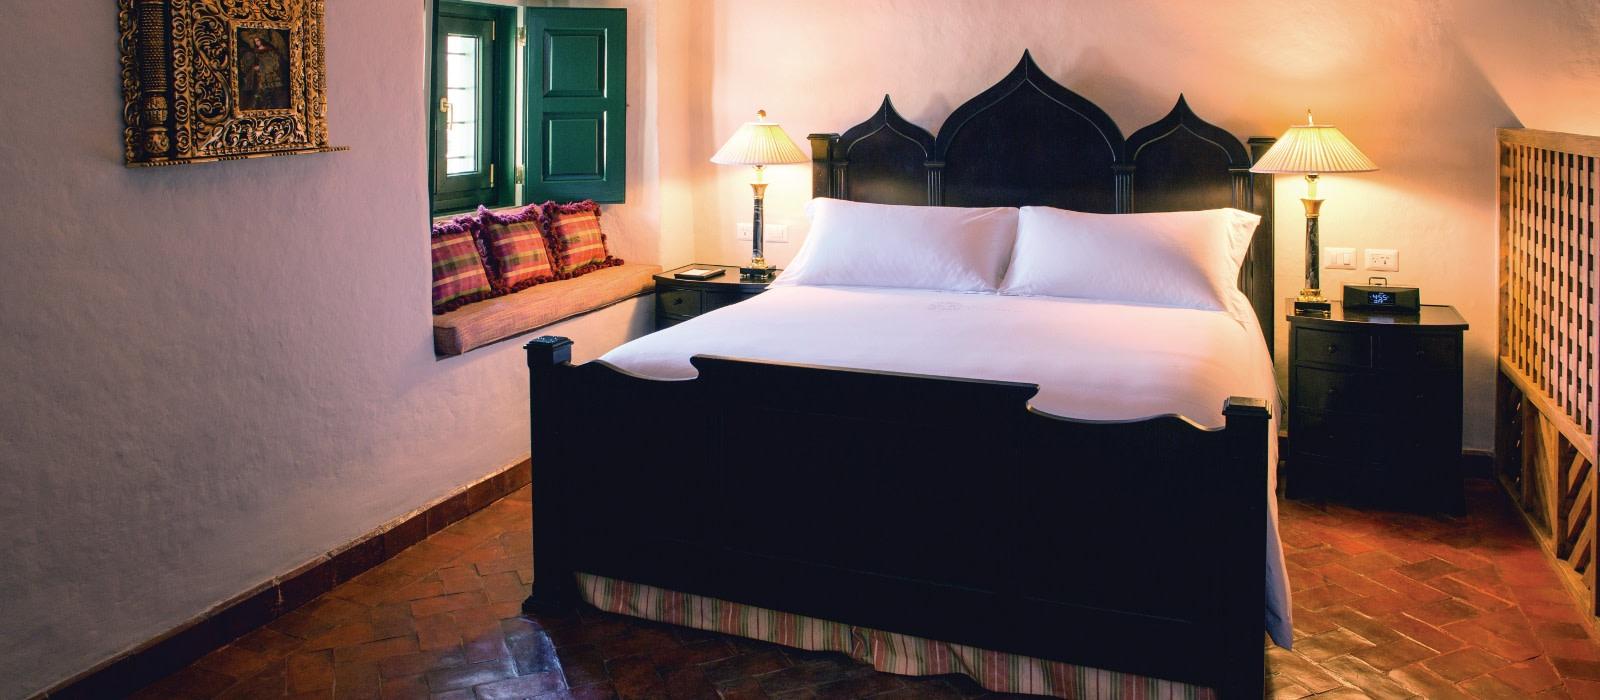 Hotel Belmond Monasterio Peru